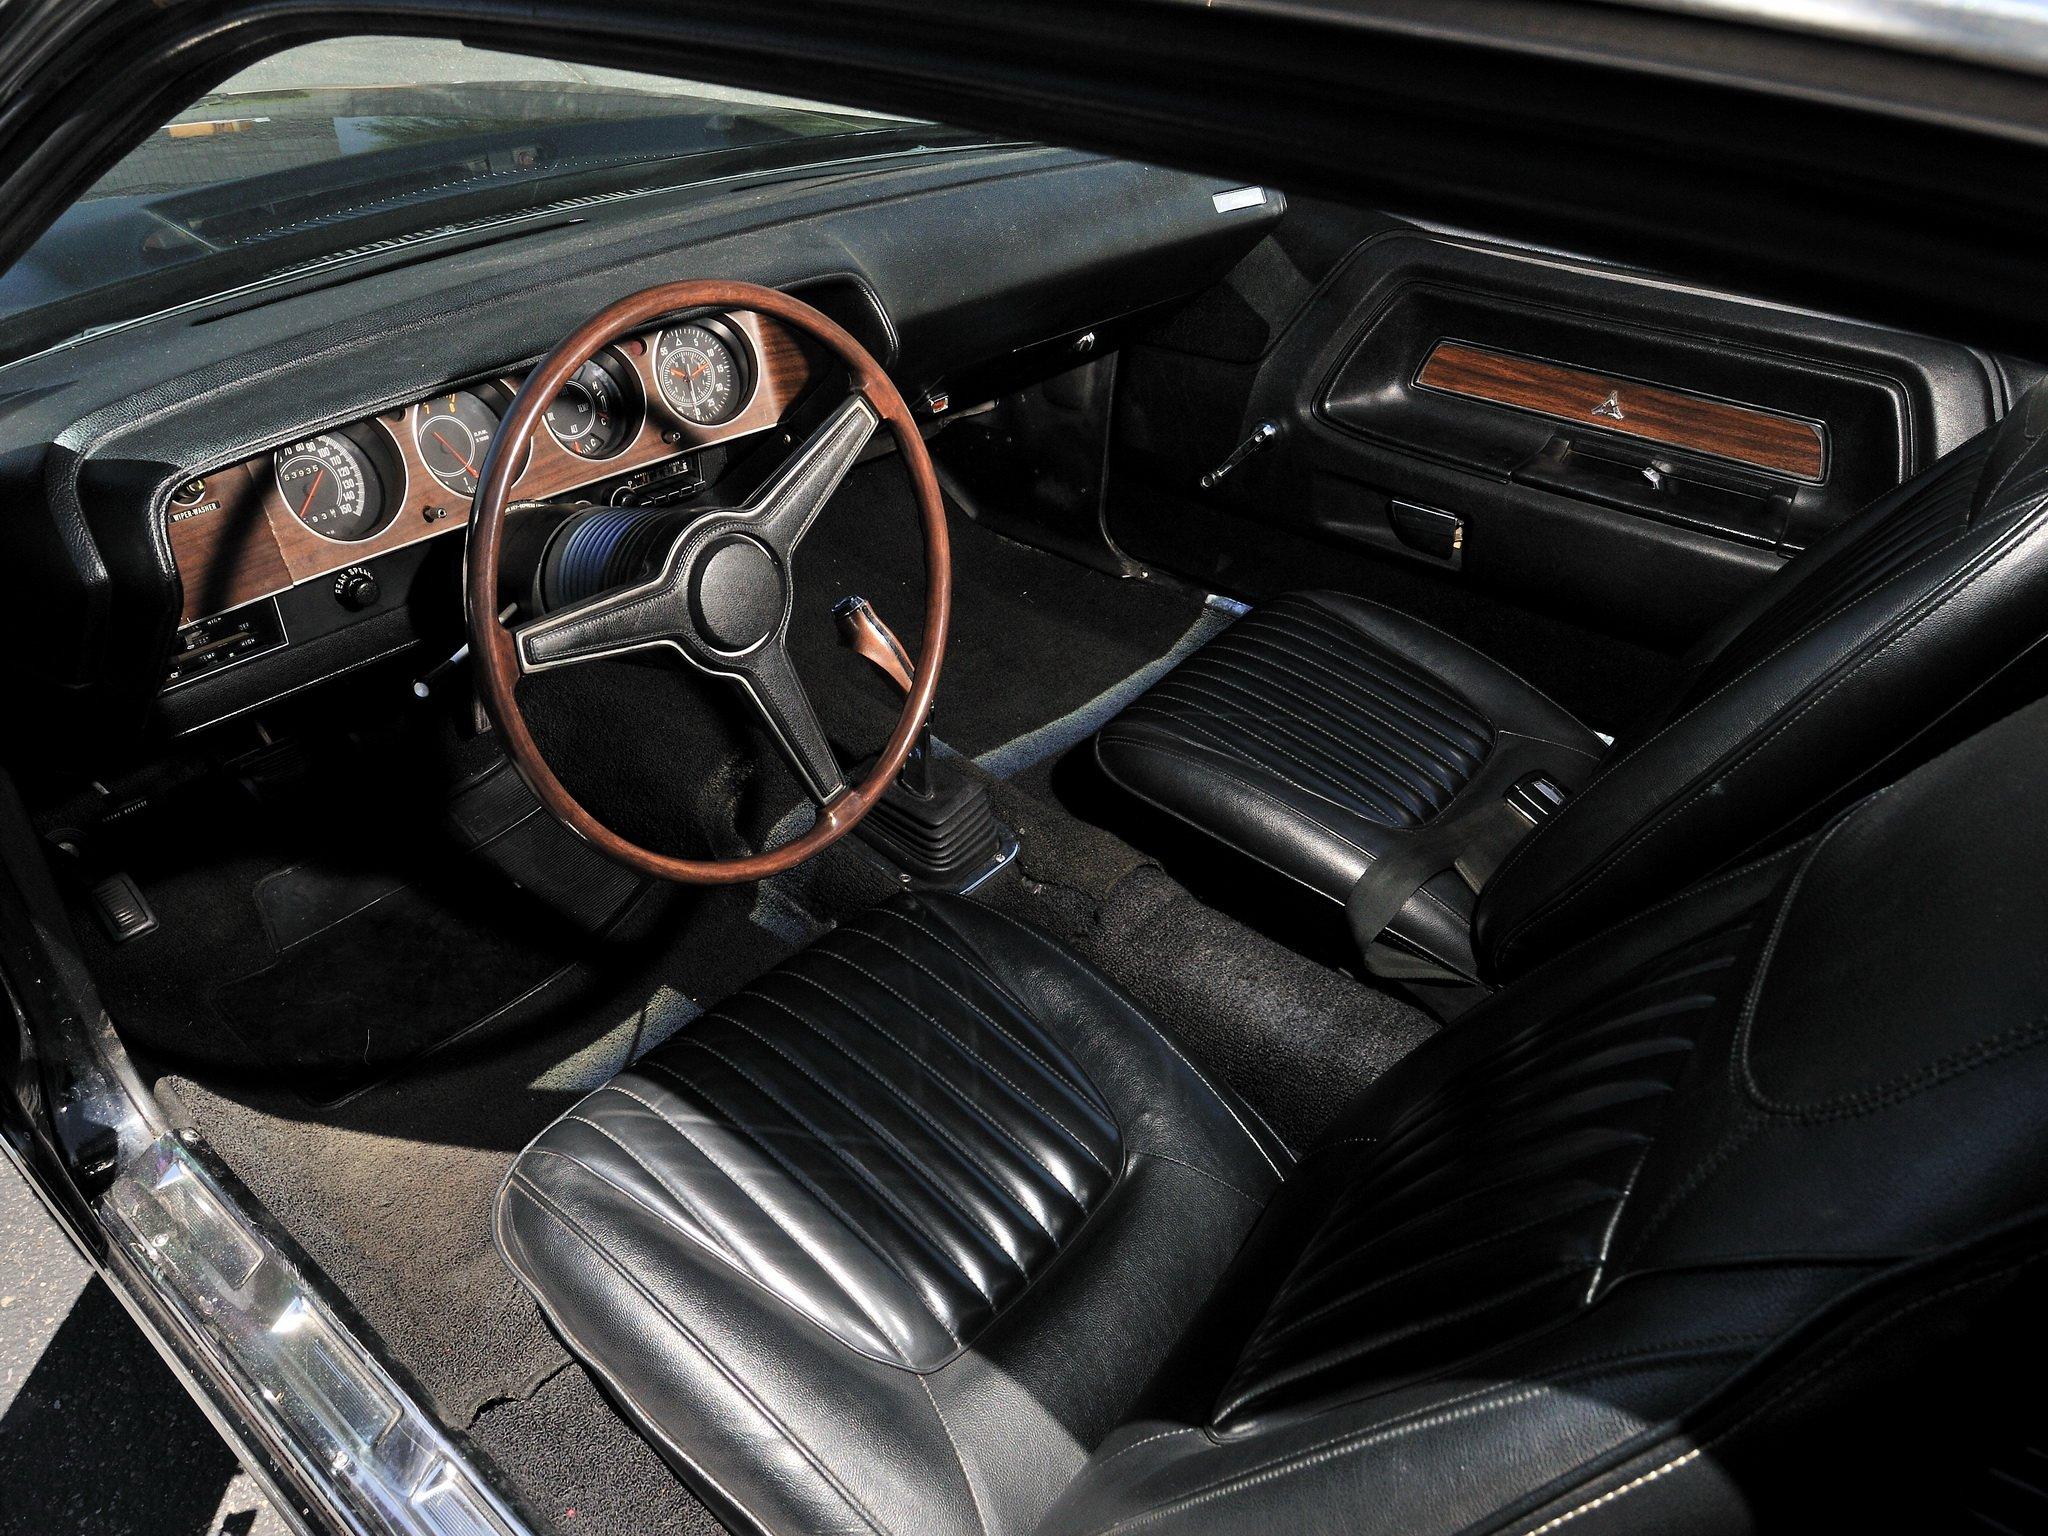 1971 Dodge Challenger R T 426 425HP Street Hemi JS23 muscle classic 2048x1536